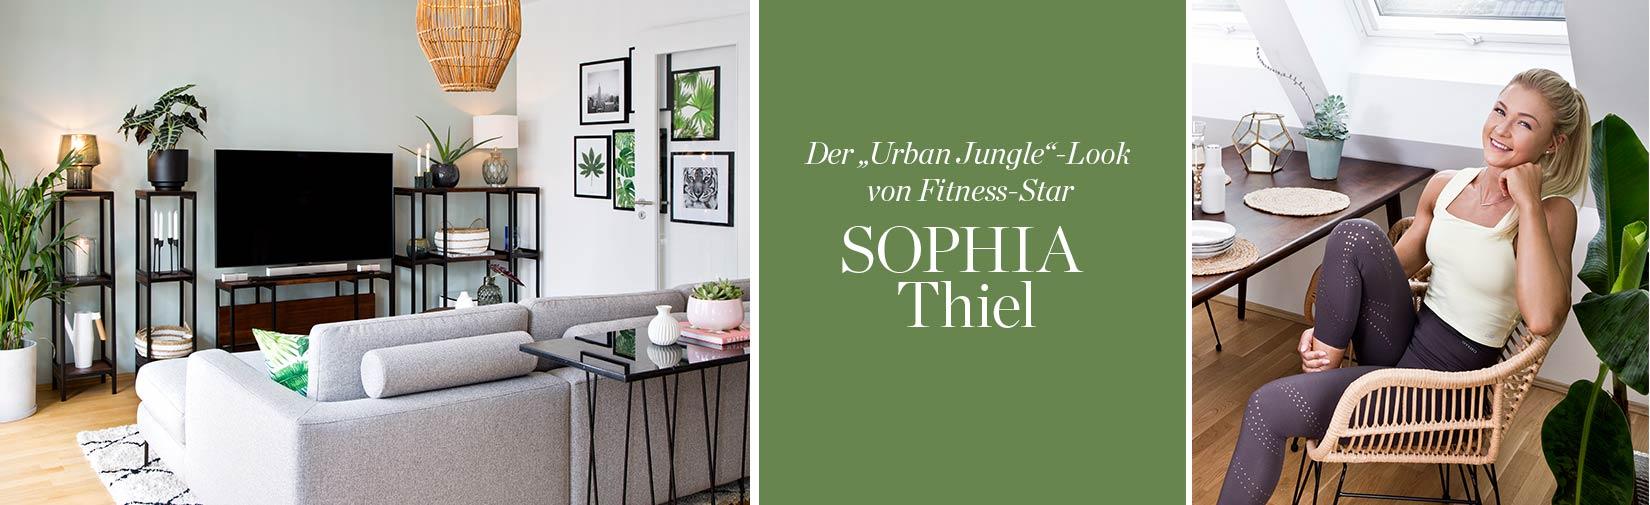 Sophia_Thiel_Banner-Desktop